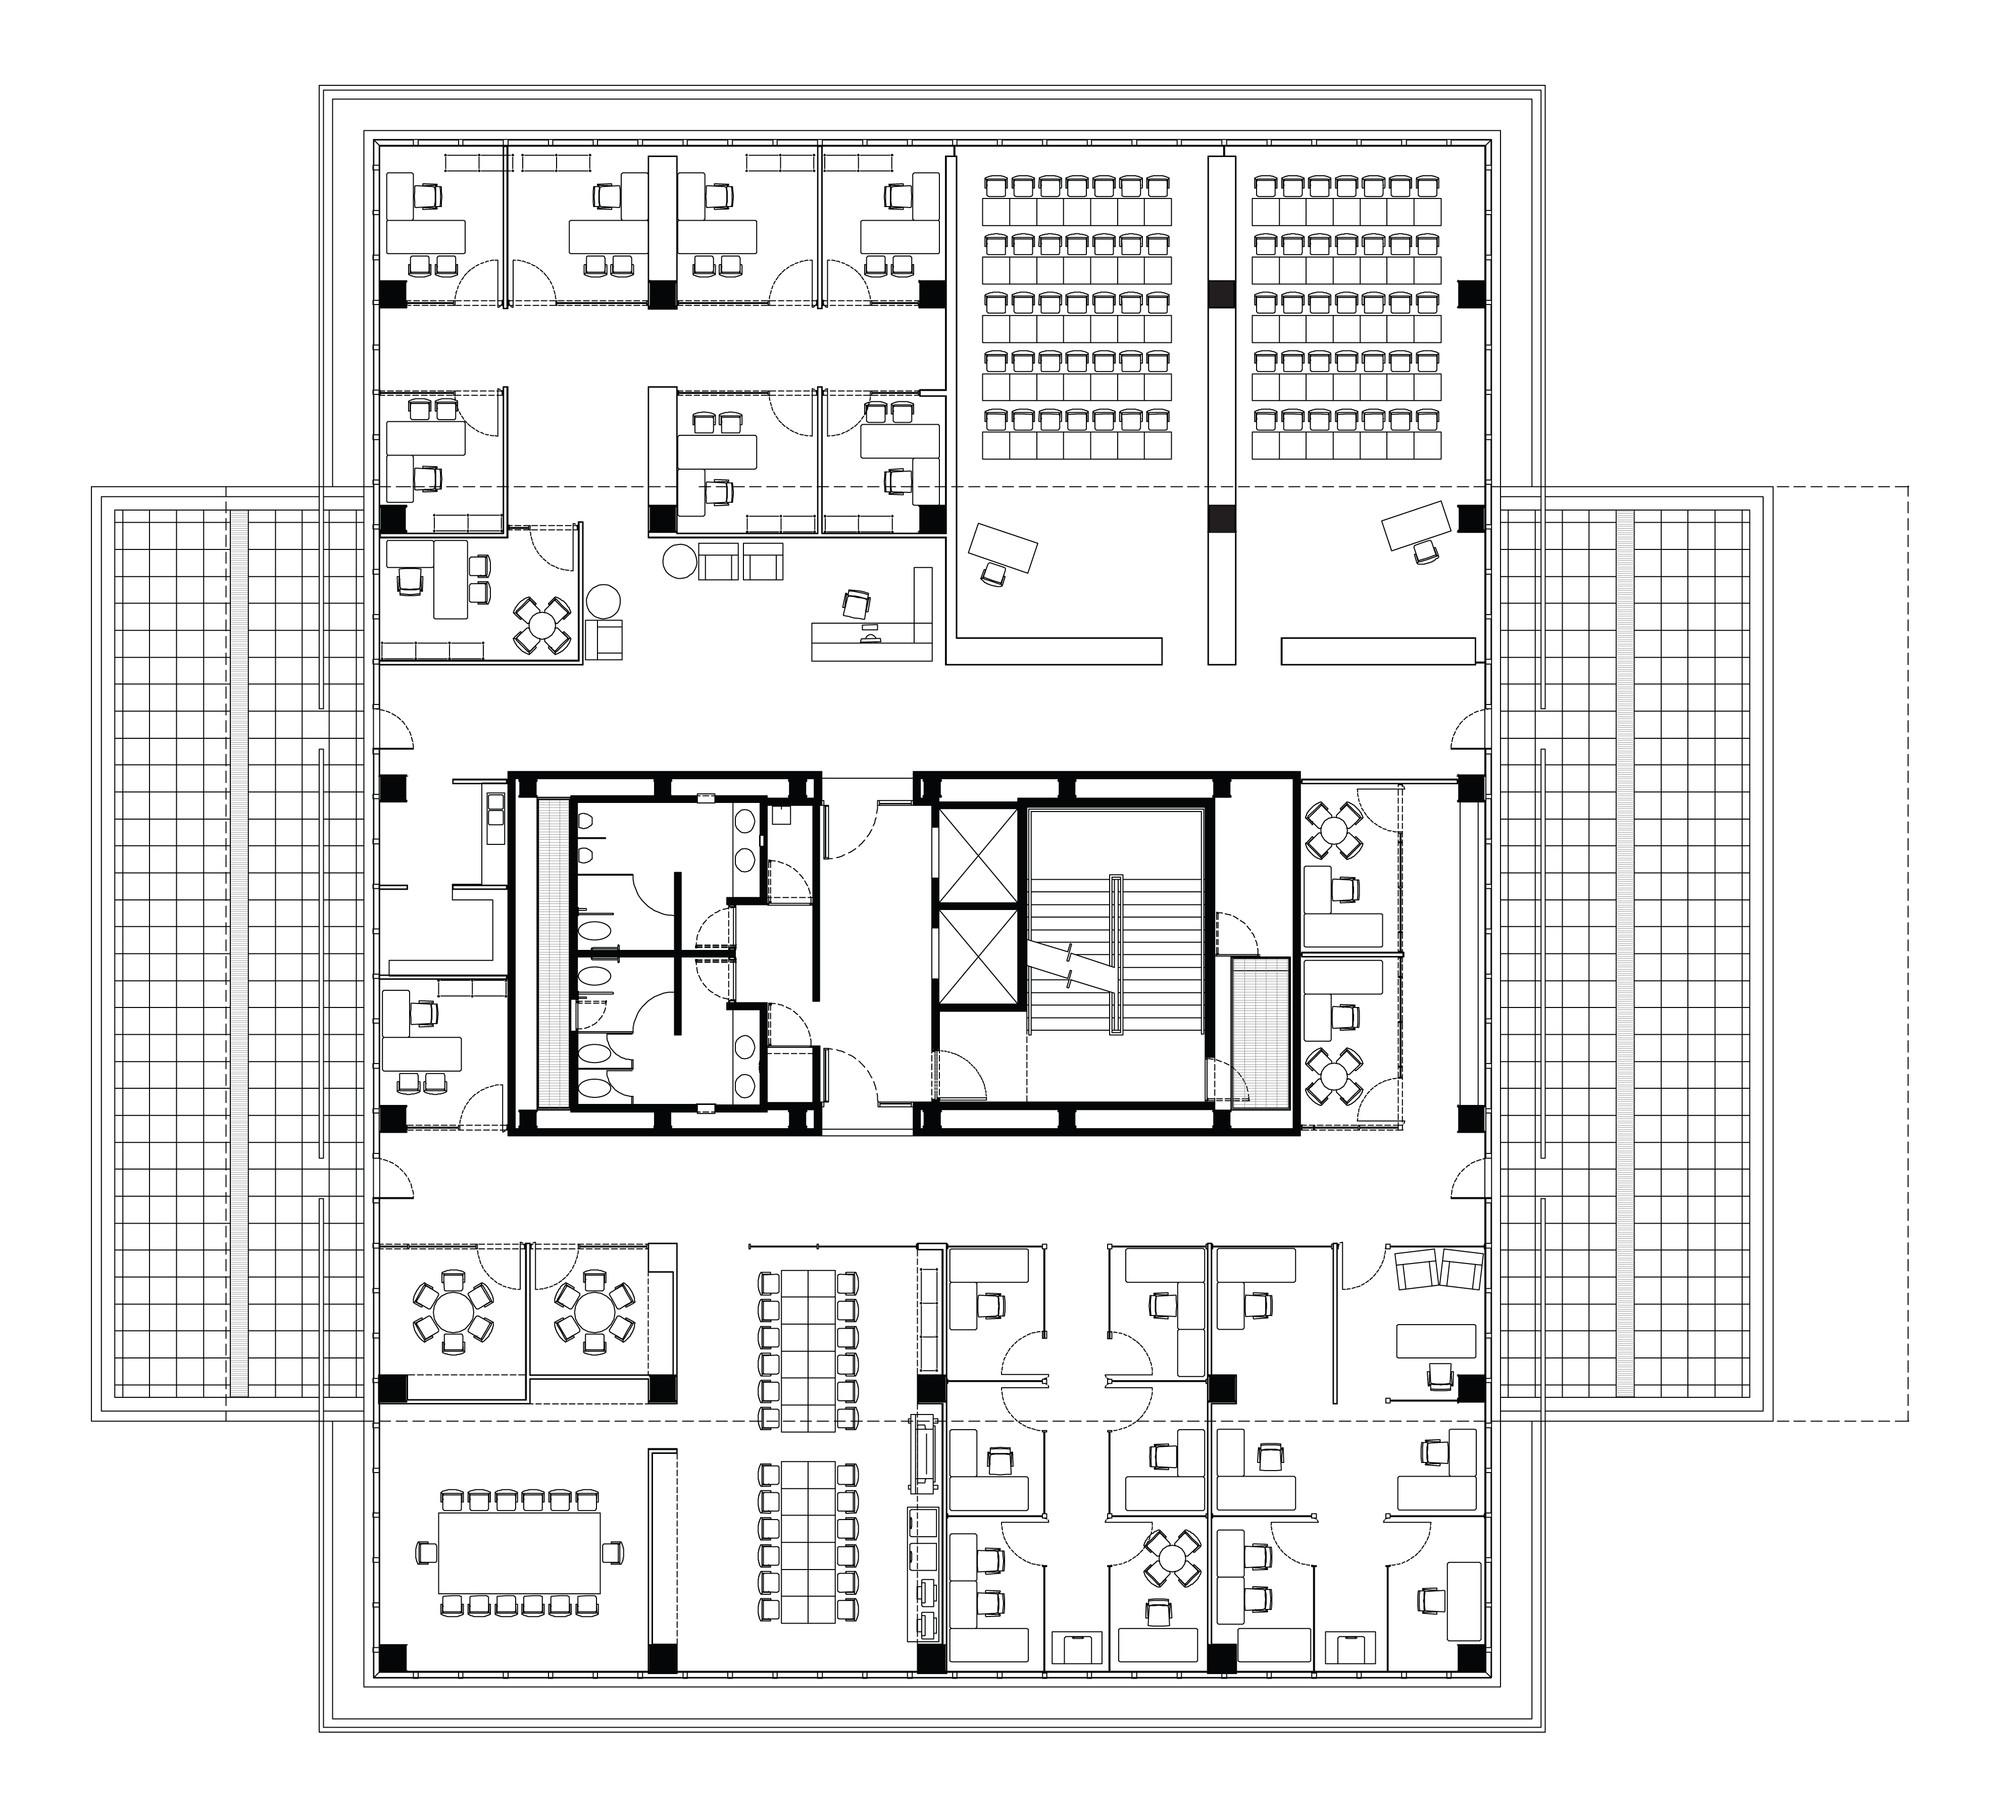 Villa Savoye Floor Plan Gallery Of Bioinnova Tatiana Bilbao 11